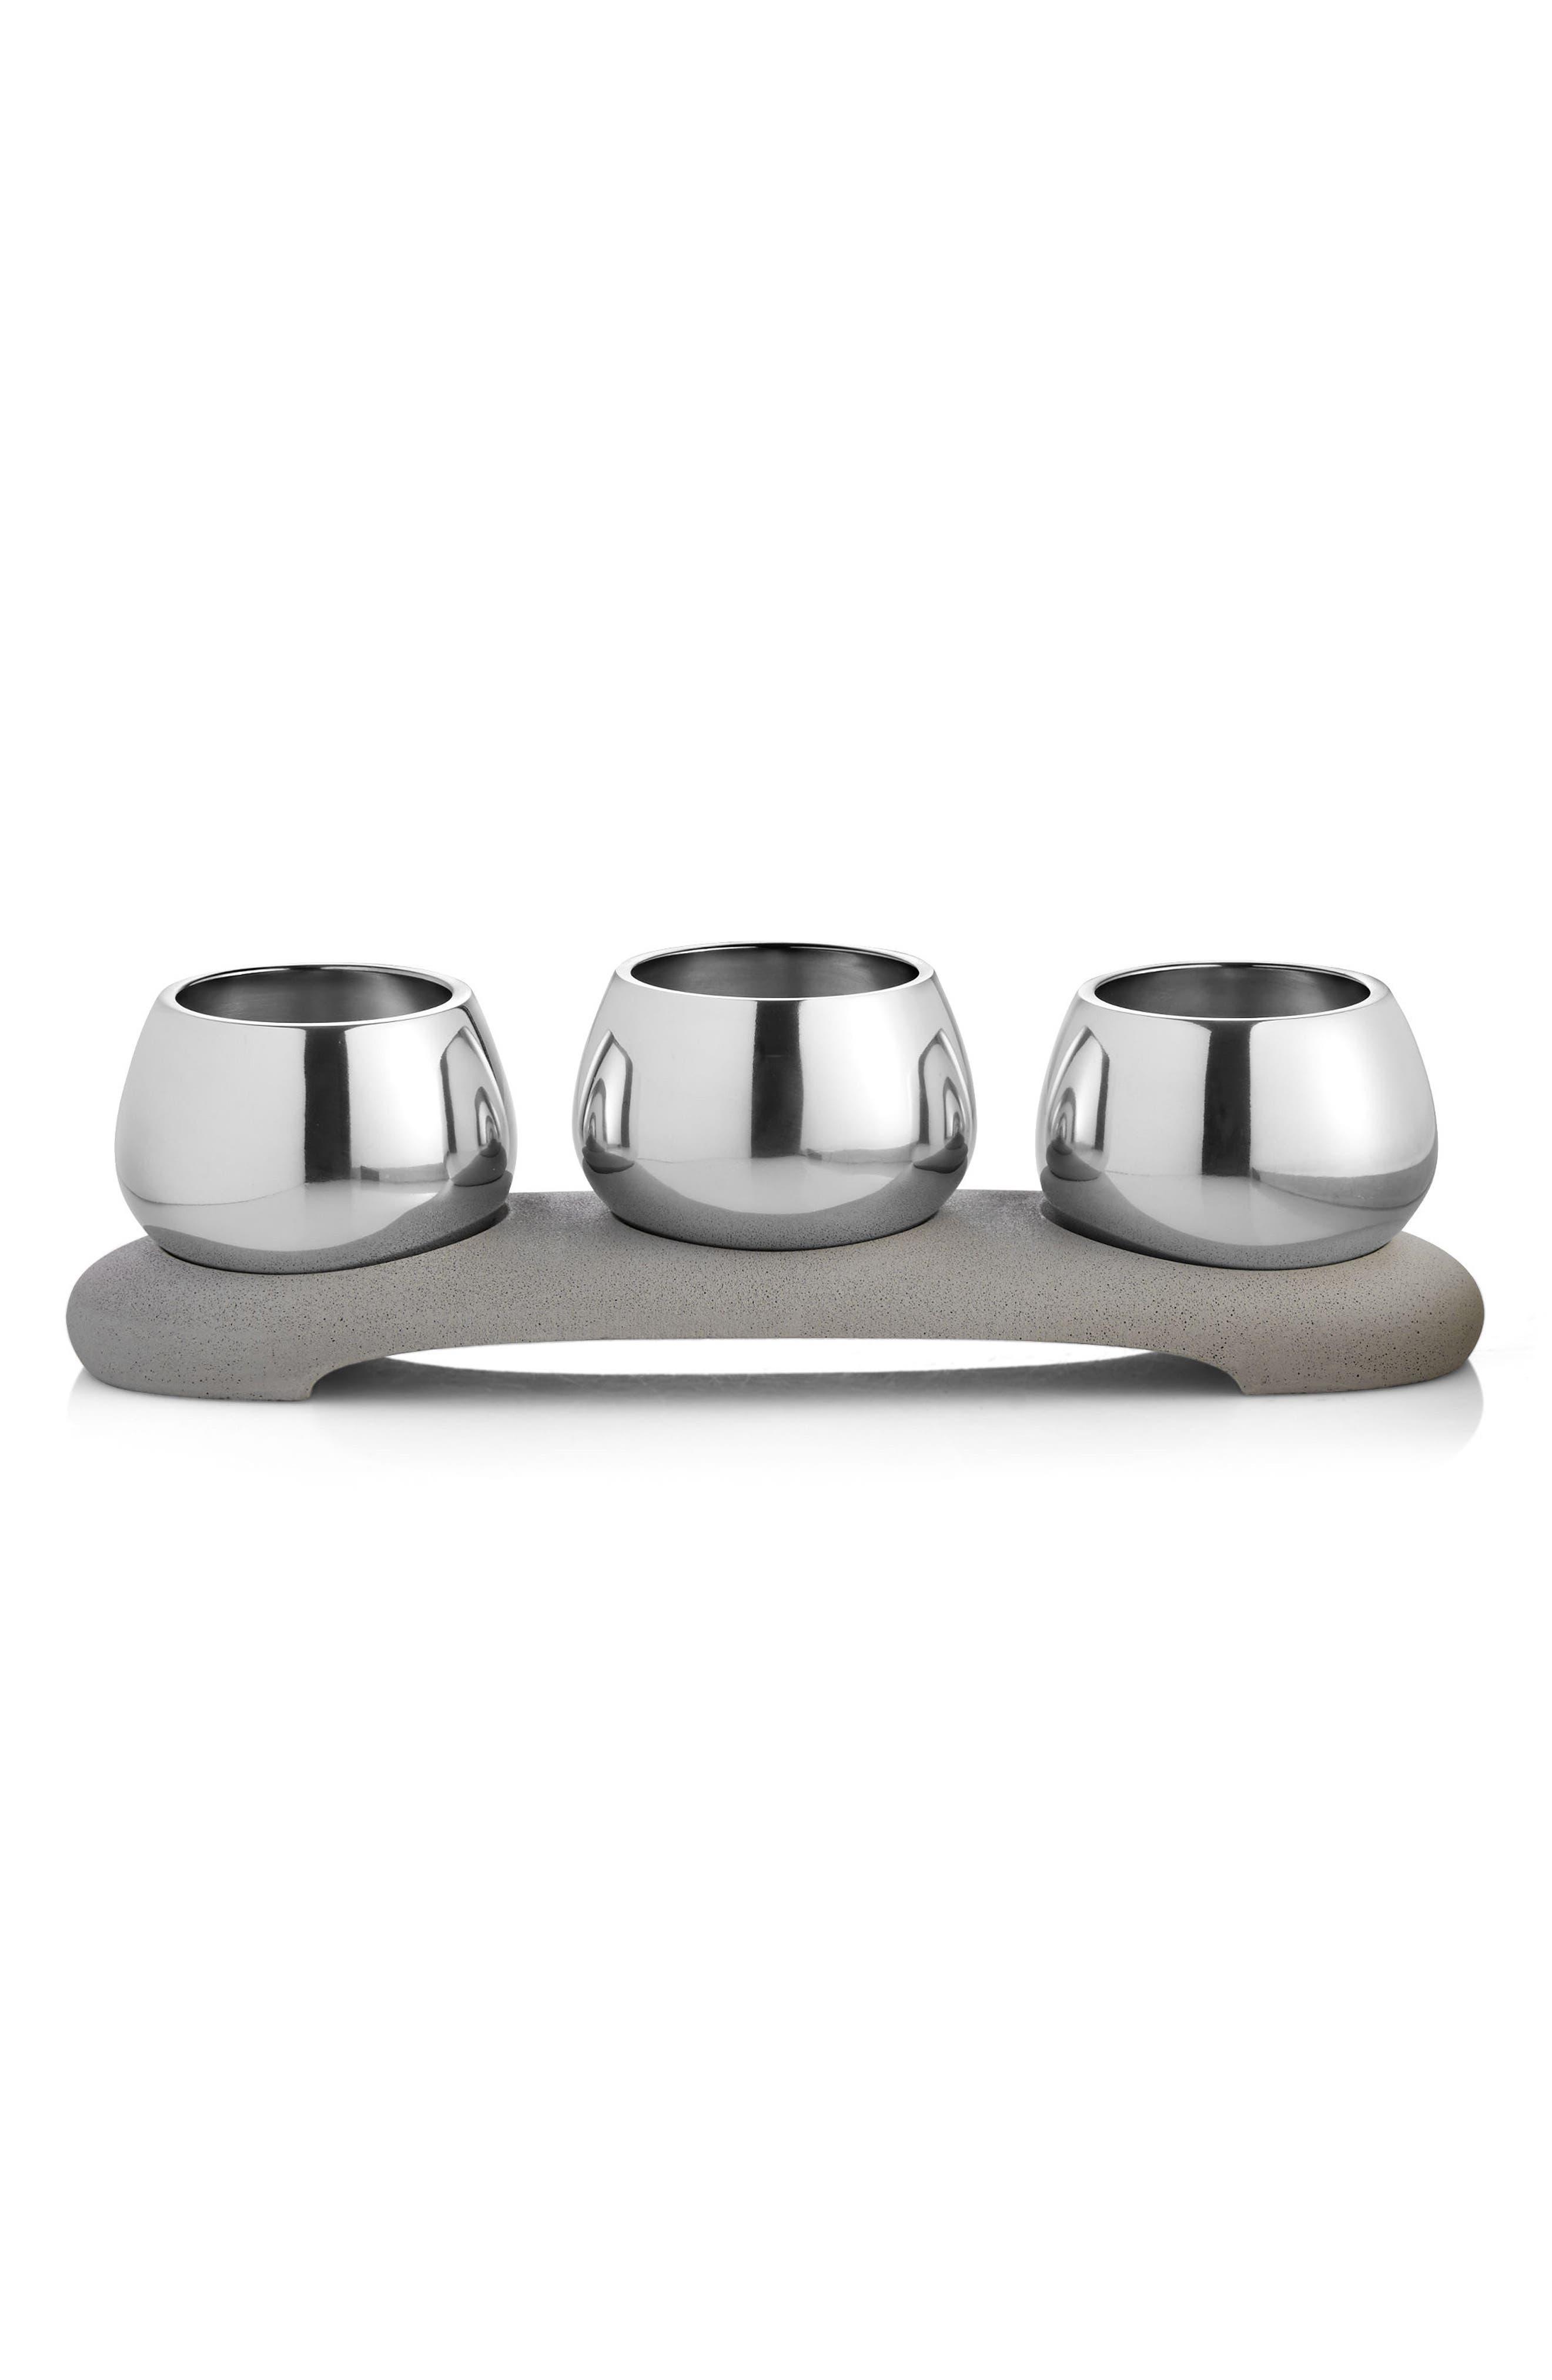 Forte 4-Piece Condiment Serving Set,                         Main,                         color, Silver/ Grey